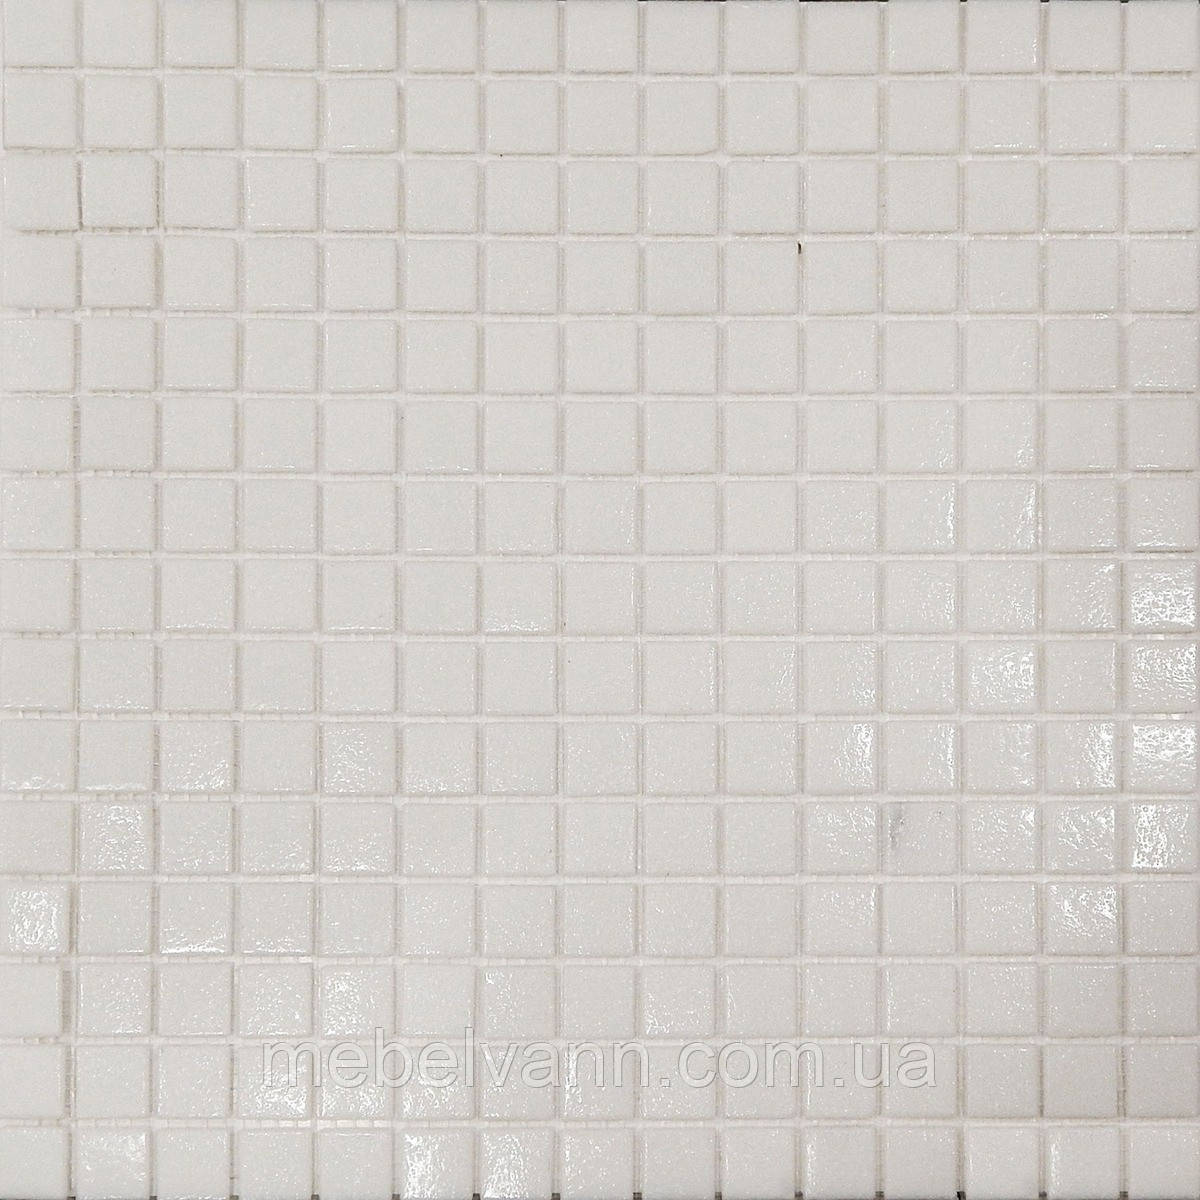 Мозаїка біла скло на сітці А11-326023